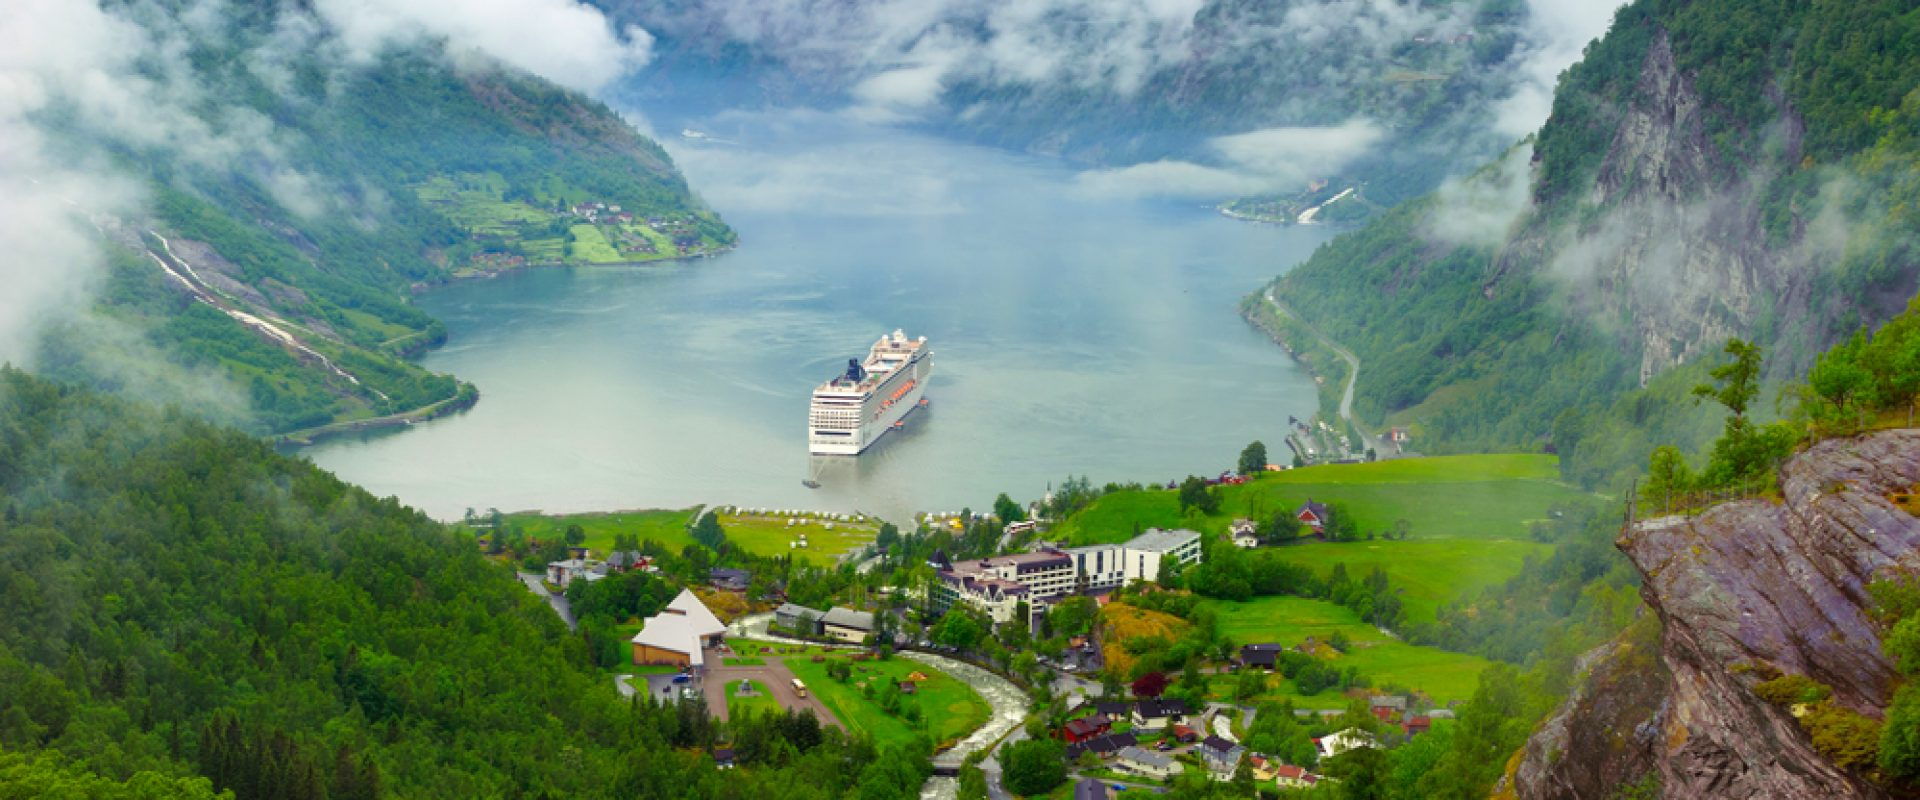 Norway cruise ship leaving a mountainous village port